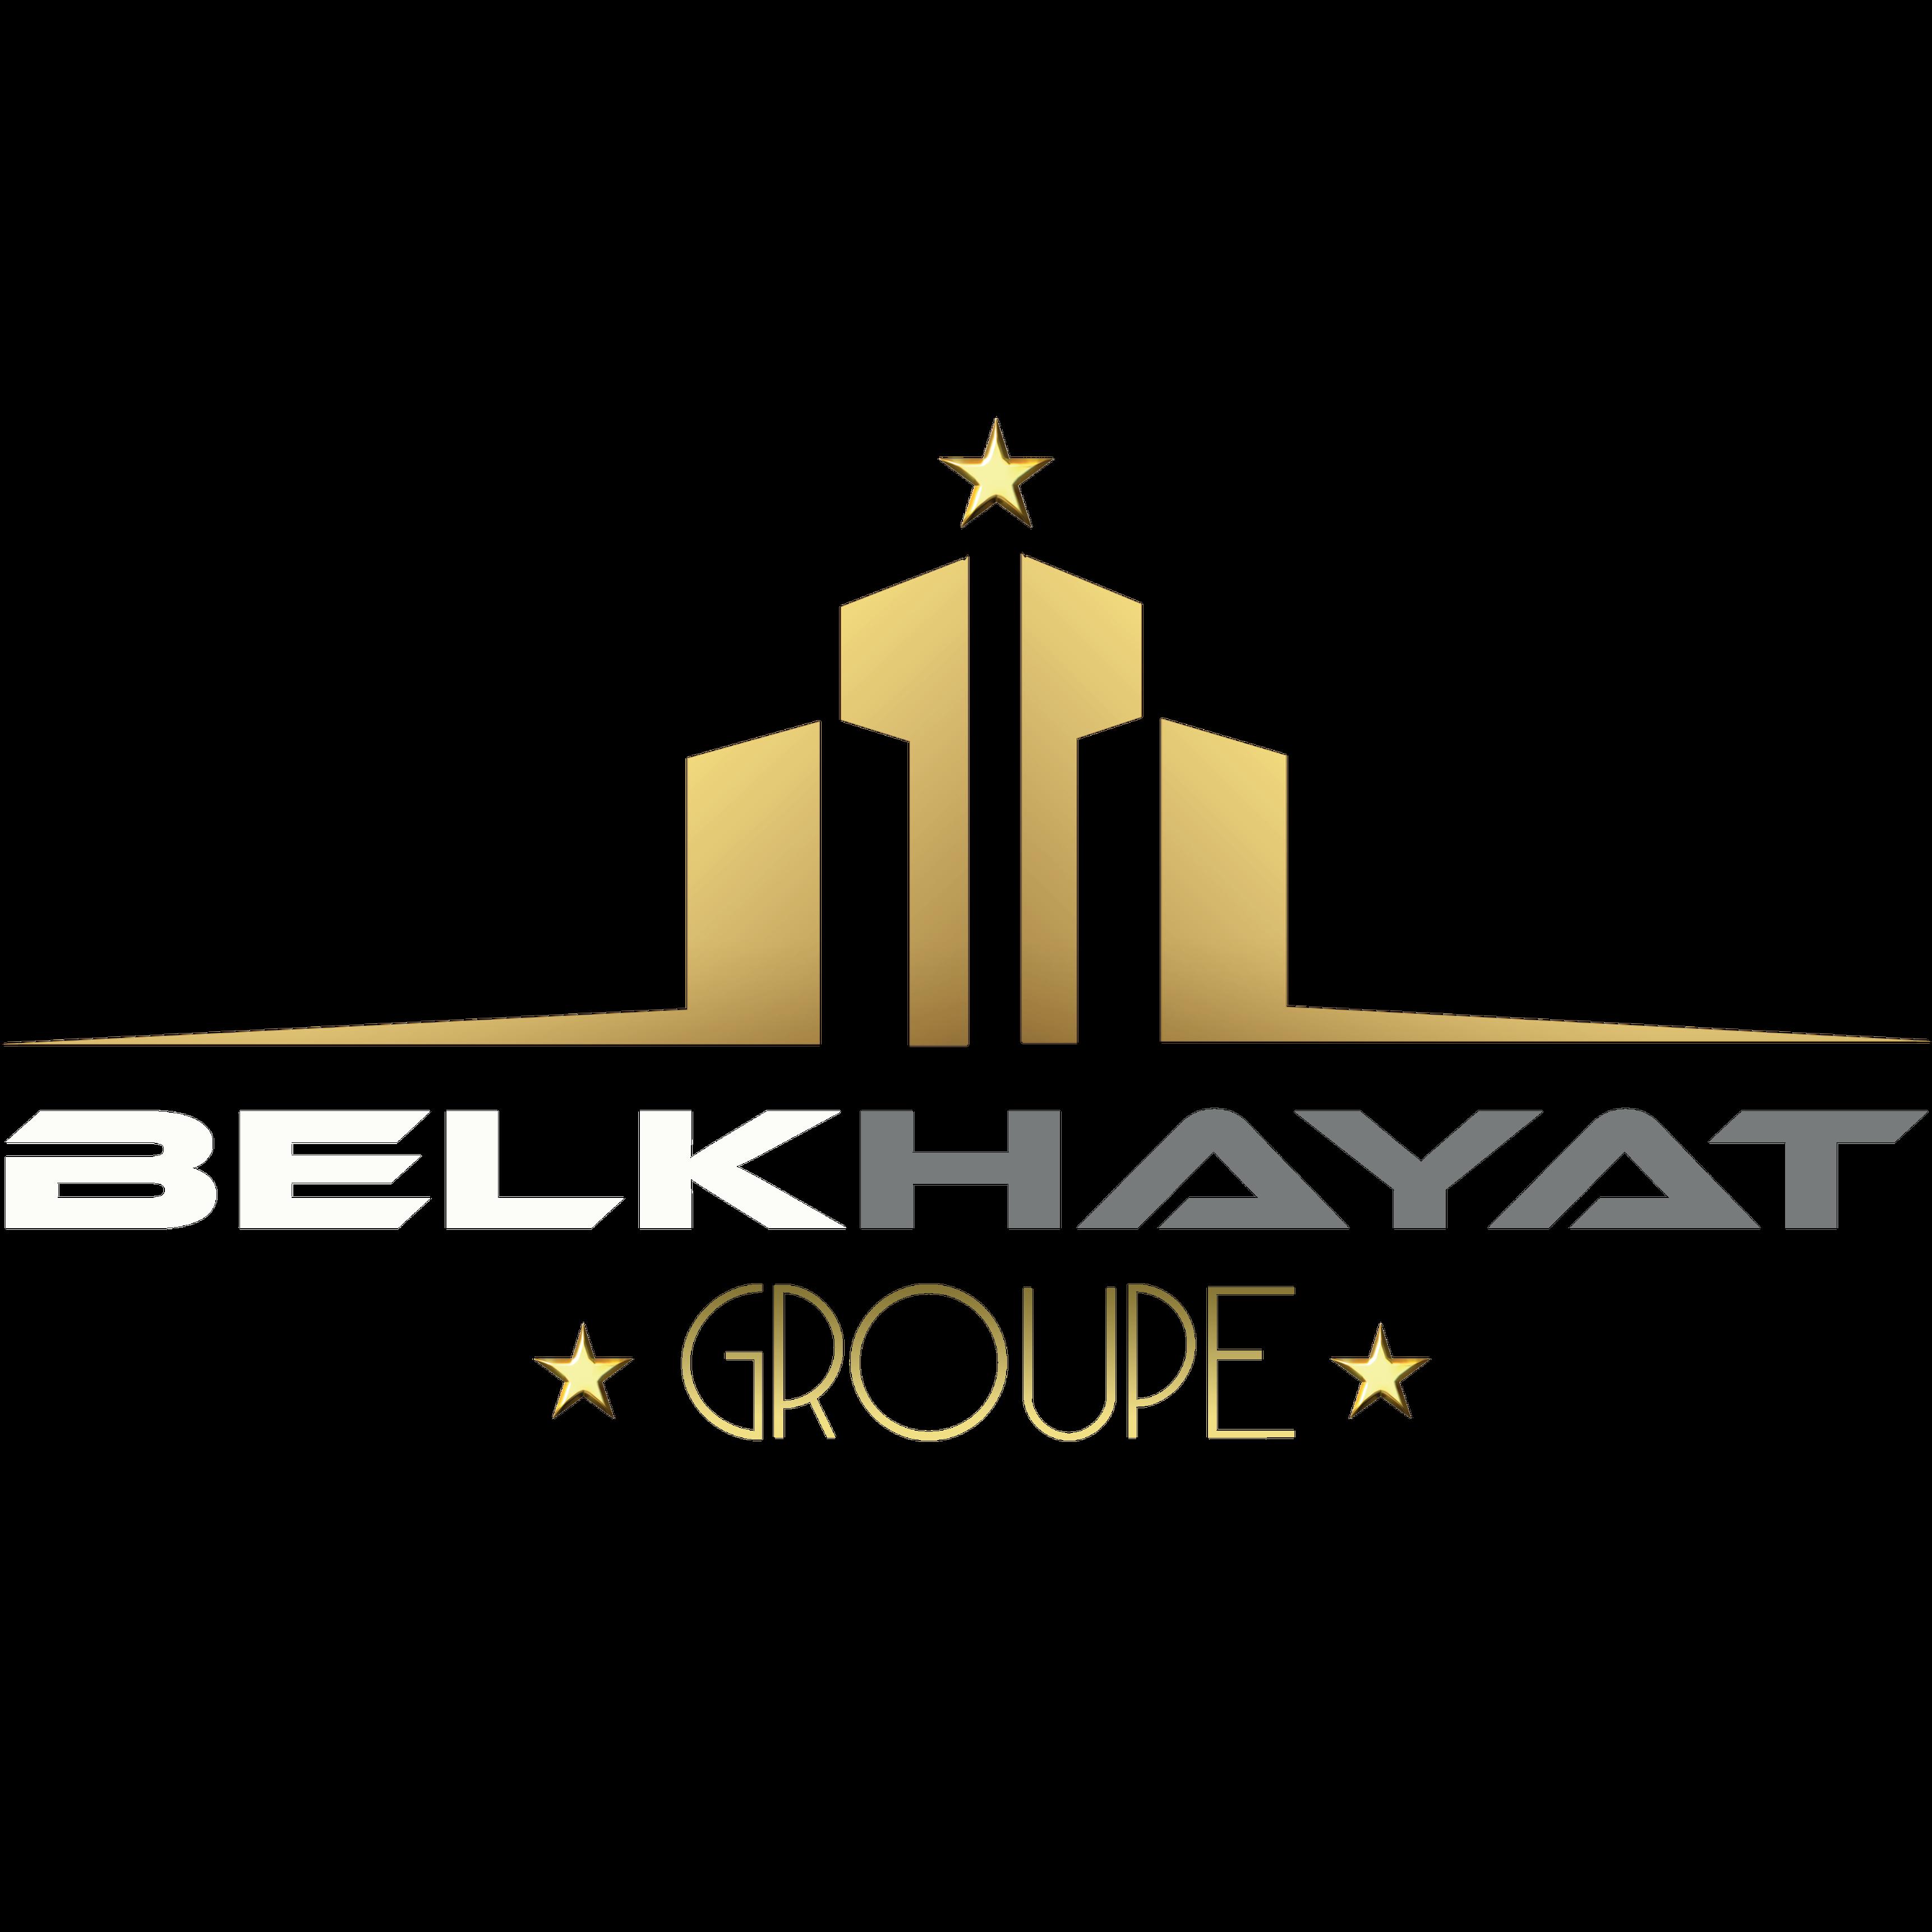 Groupe Belkhayat